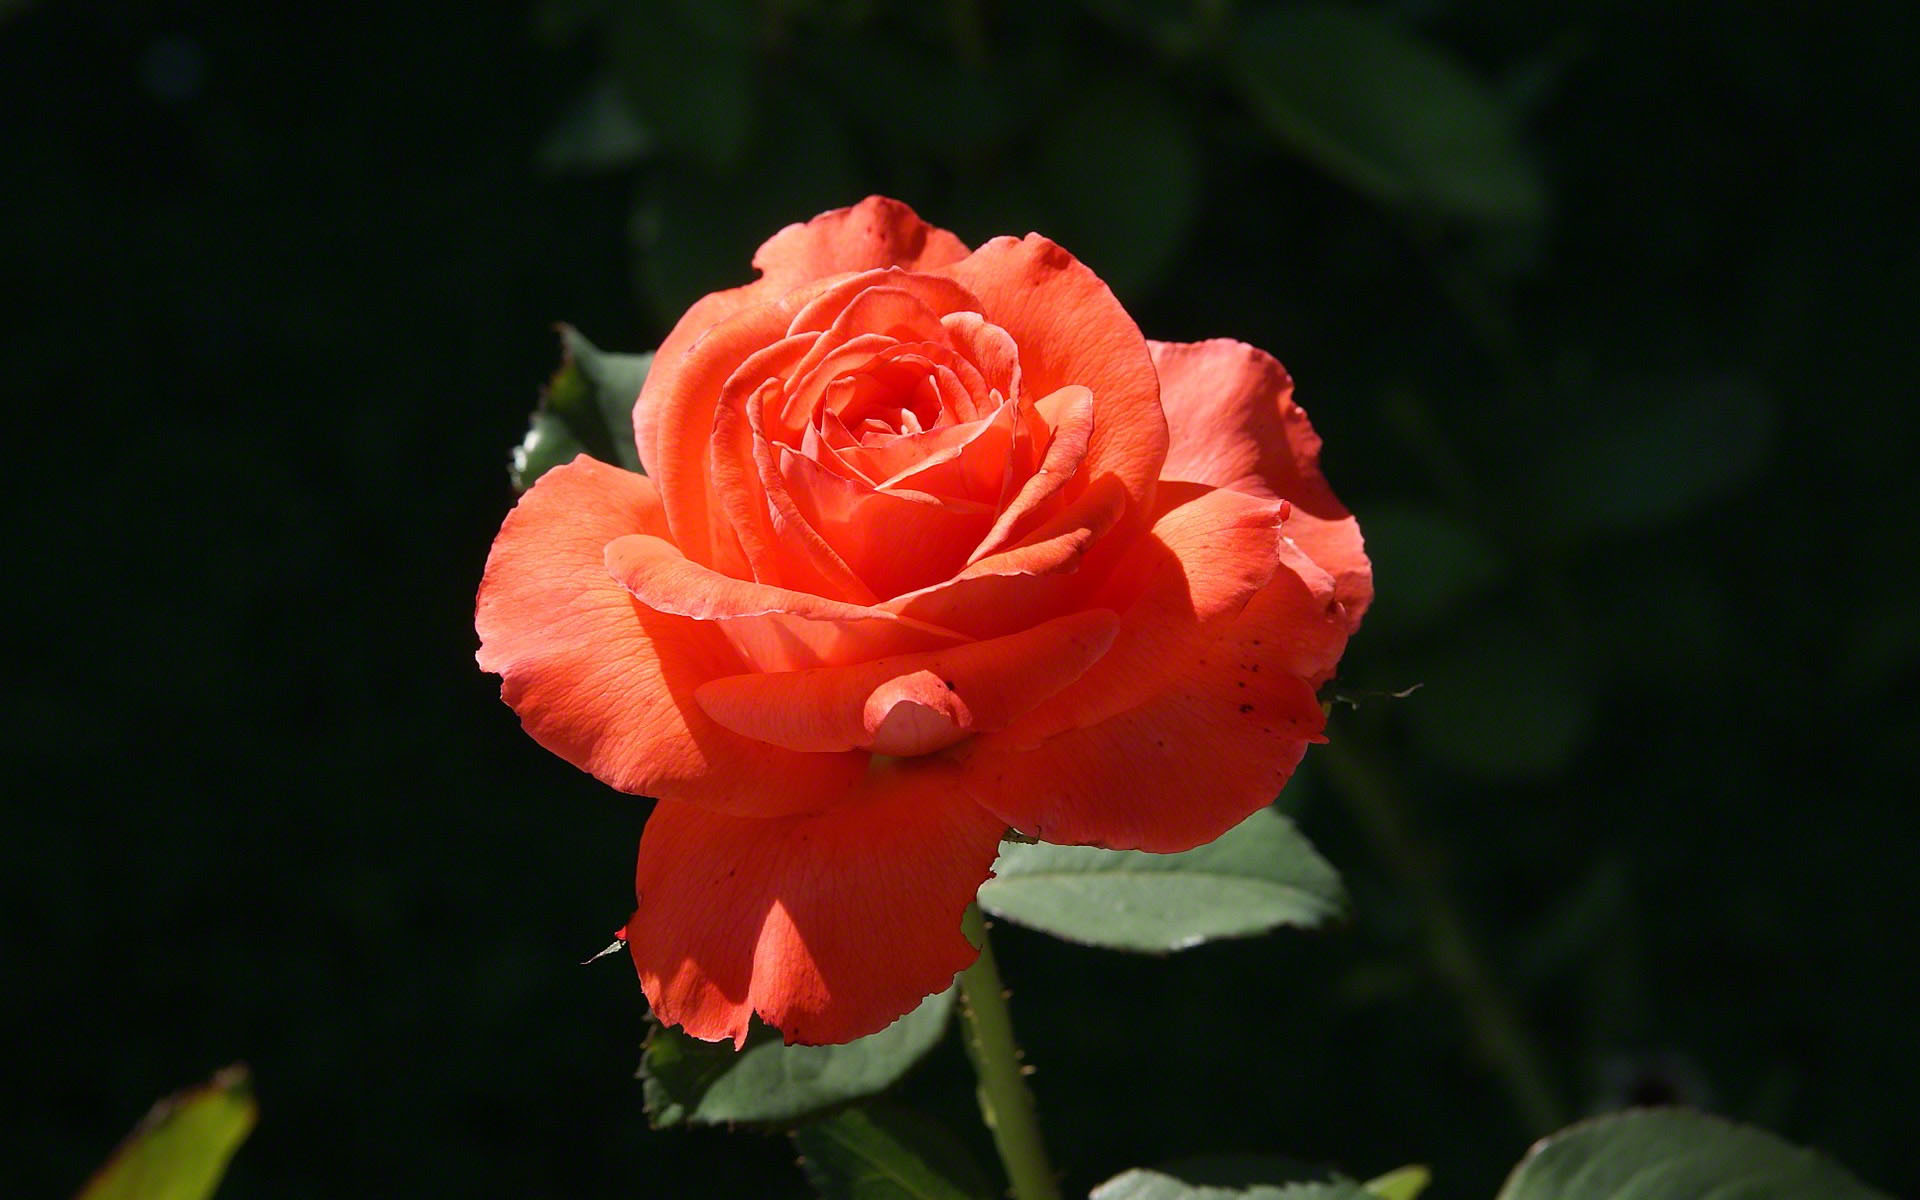 http://www.fabiovisentin.com/photography/photo/12/orange-rose-hd.jpg